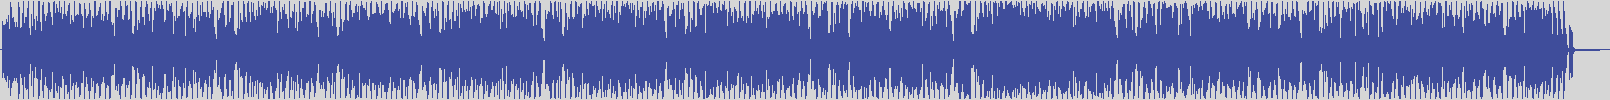 smilax_dig_records [Smilax_X448DIG] Stefy - Il Pulcino Pio [Original Mix] audio wave form